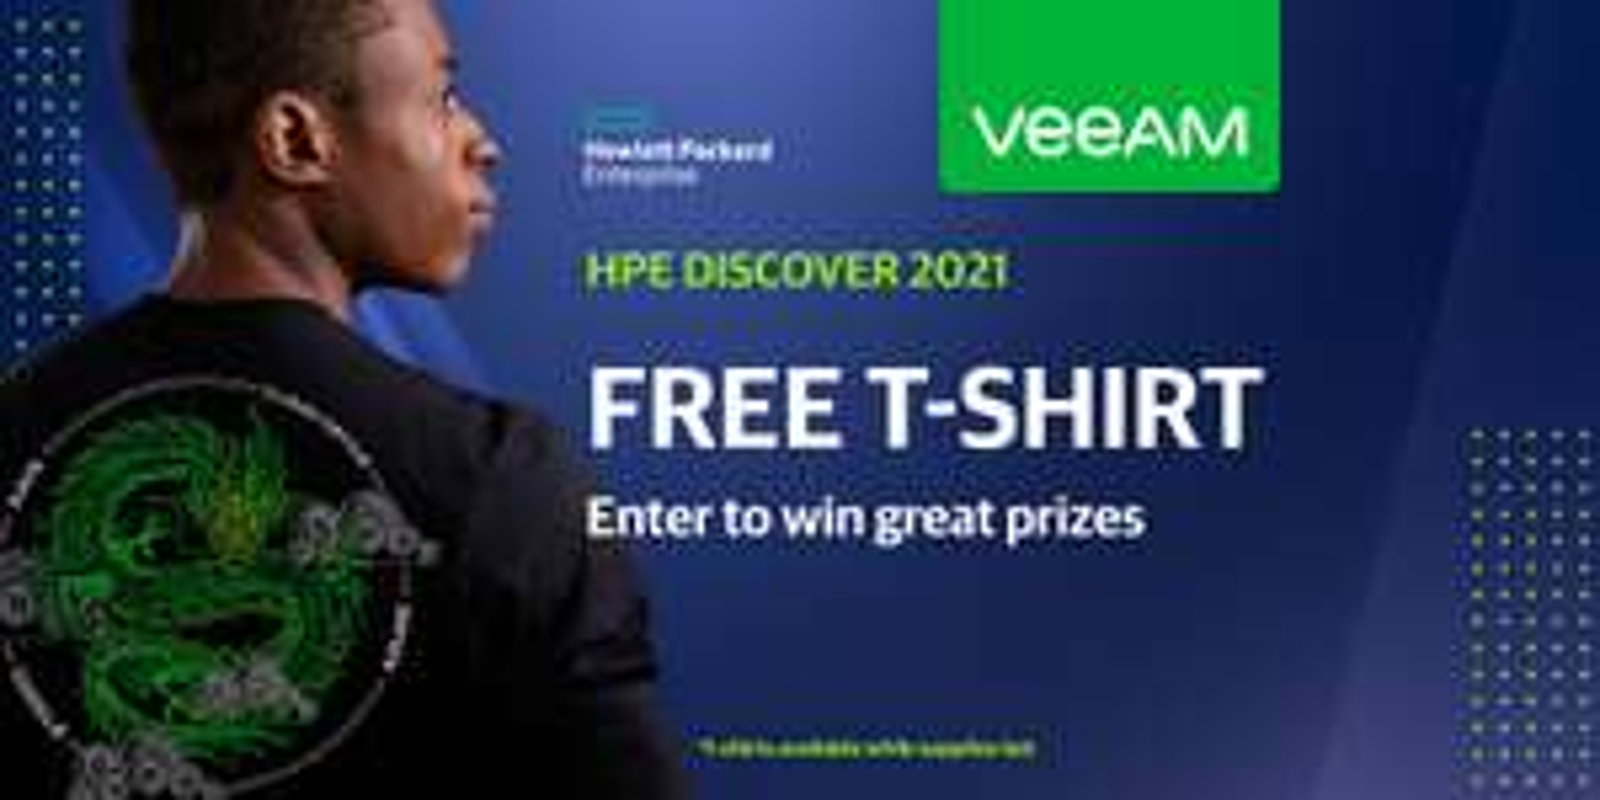 Gratis HPE Veeam Langarmshirt mit Business Email